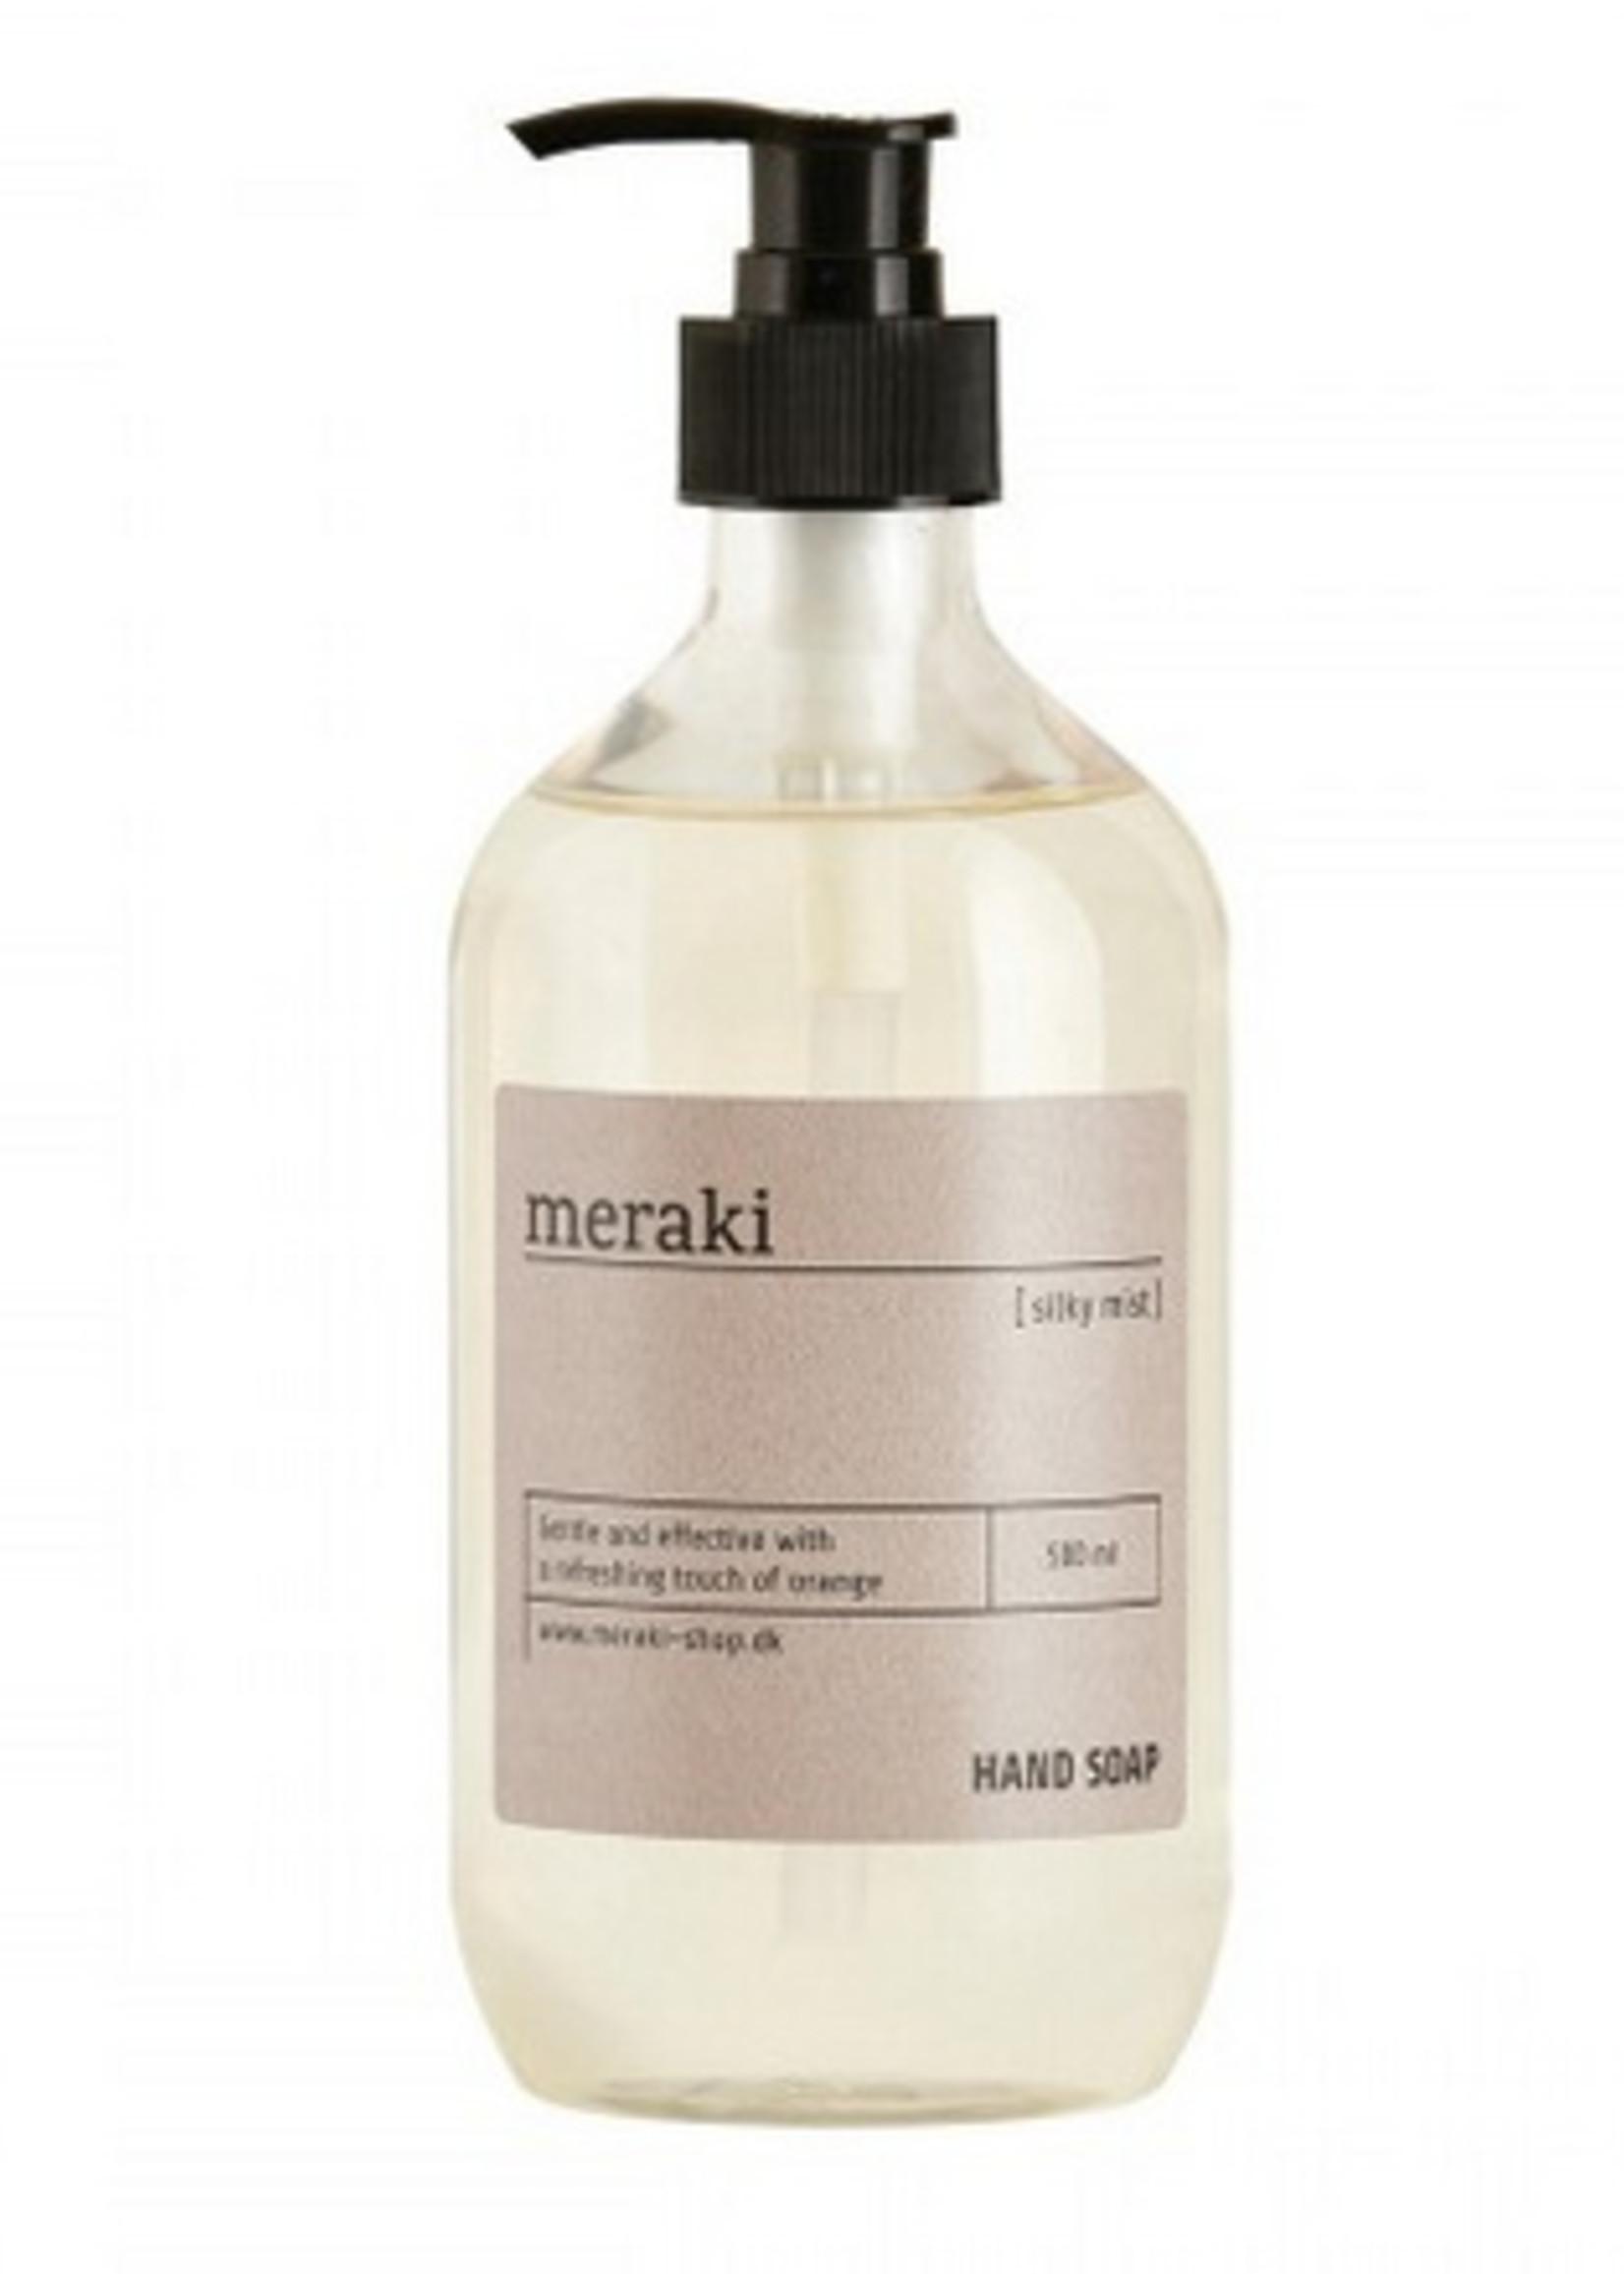 Meraki Hand soap - Silky mist